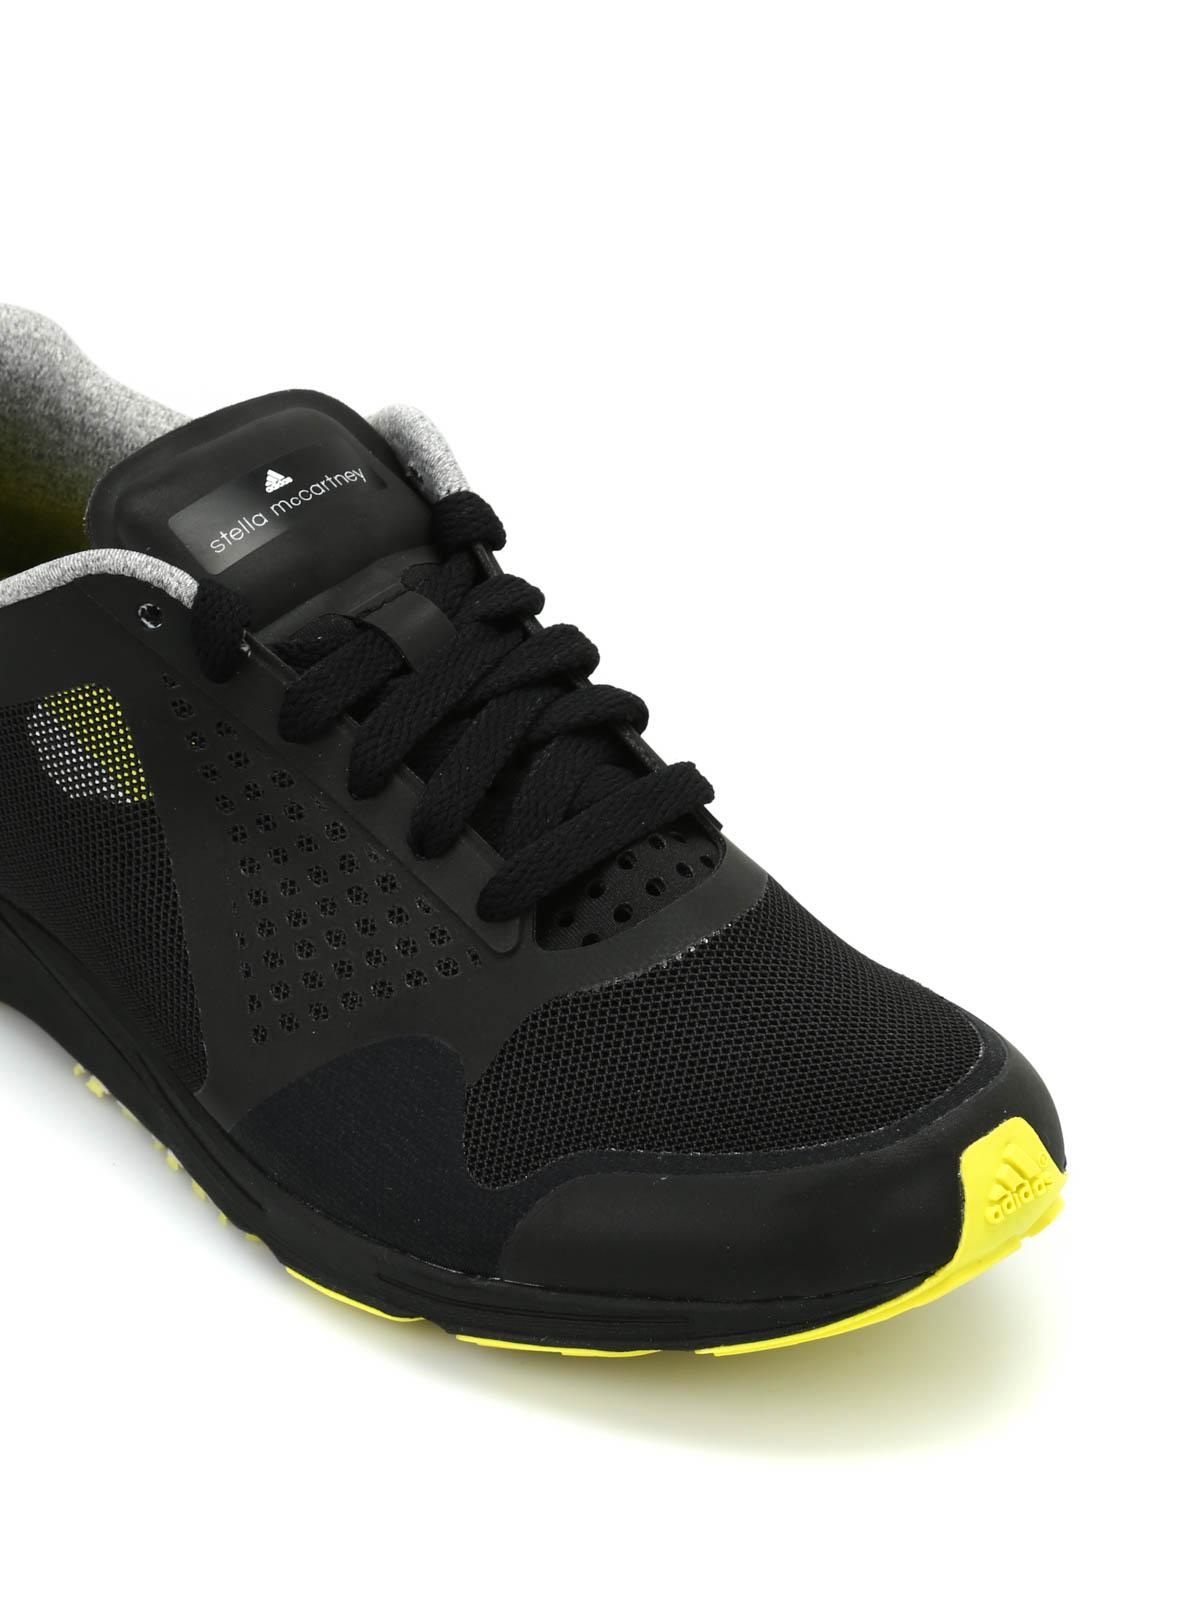 adizero takumi training shoes by adidas by stella mccartney trainers ikrix. Black Bedroom Furniture Sets. Home Design Ideas